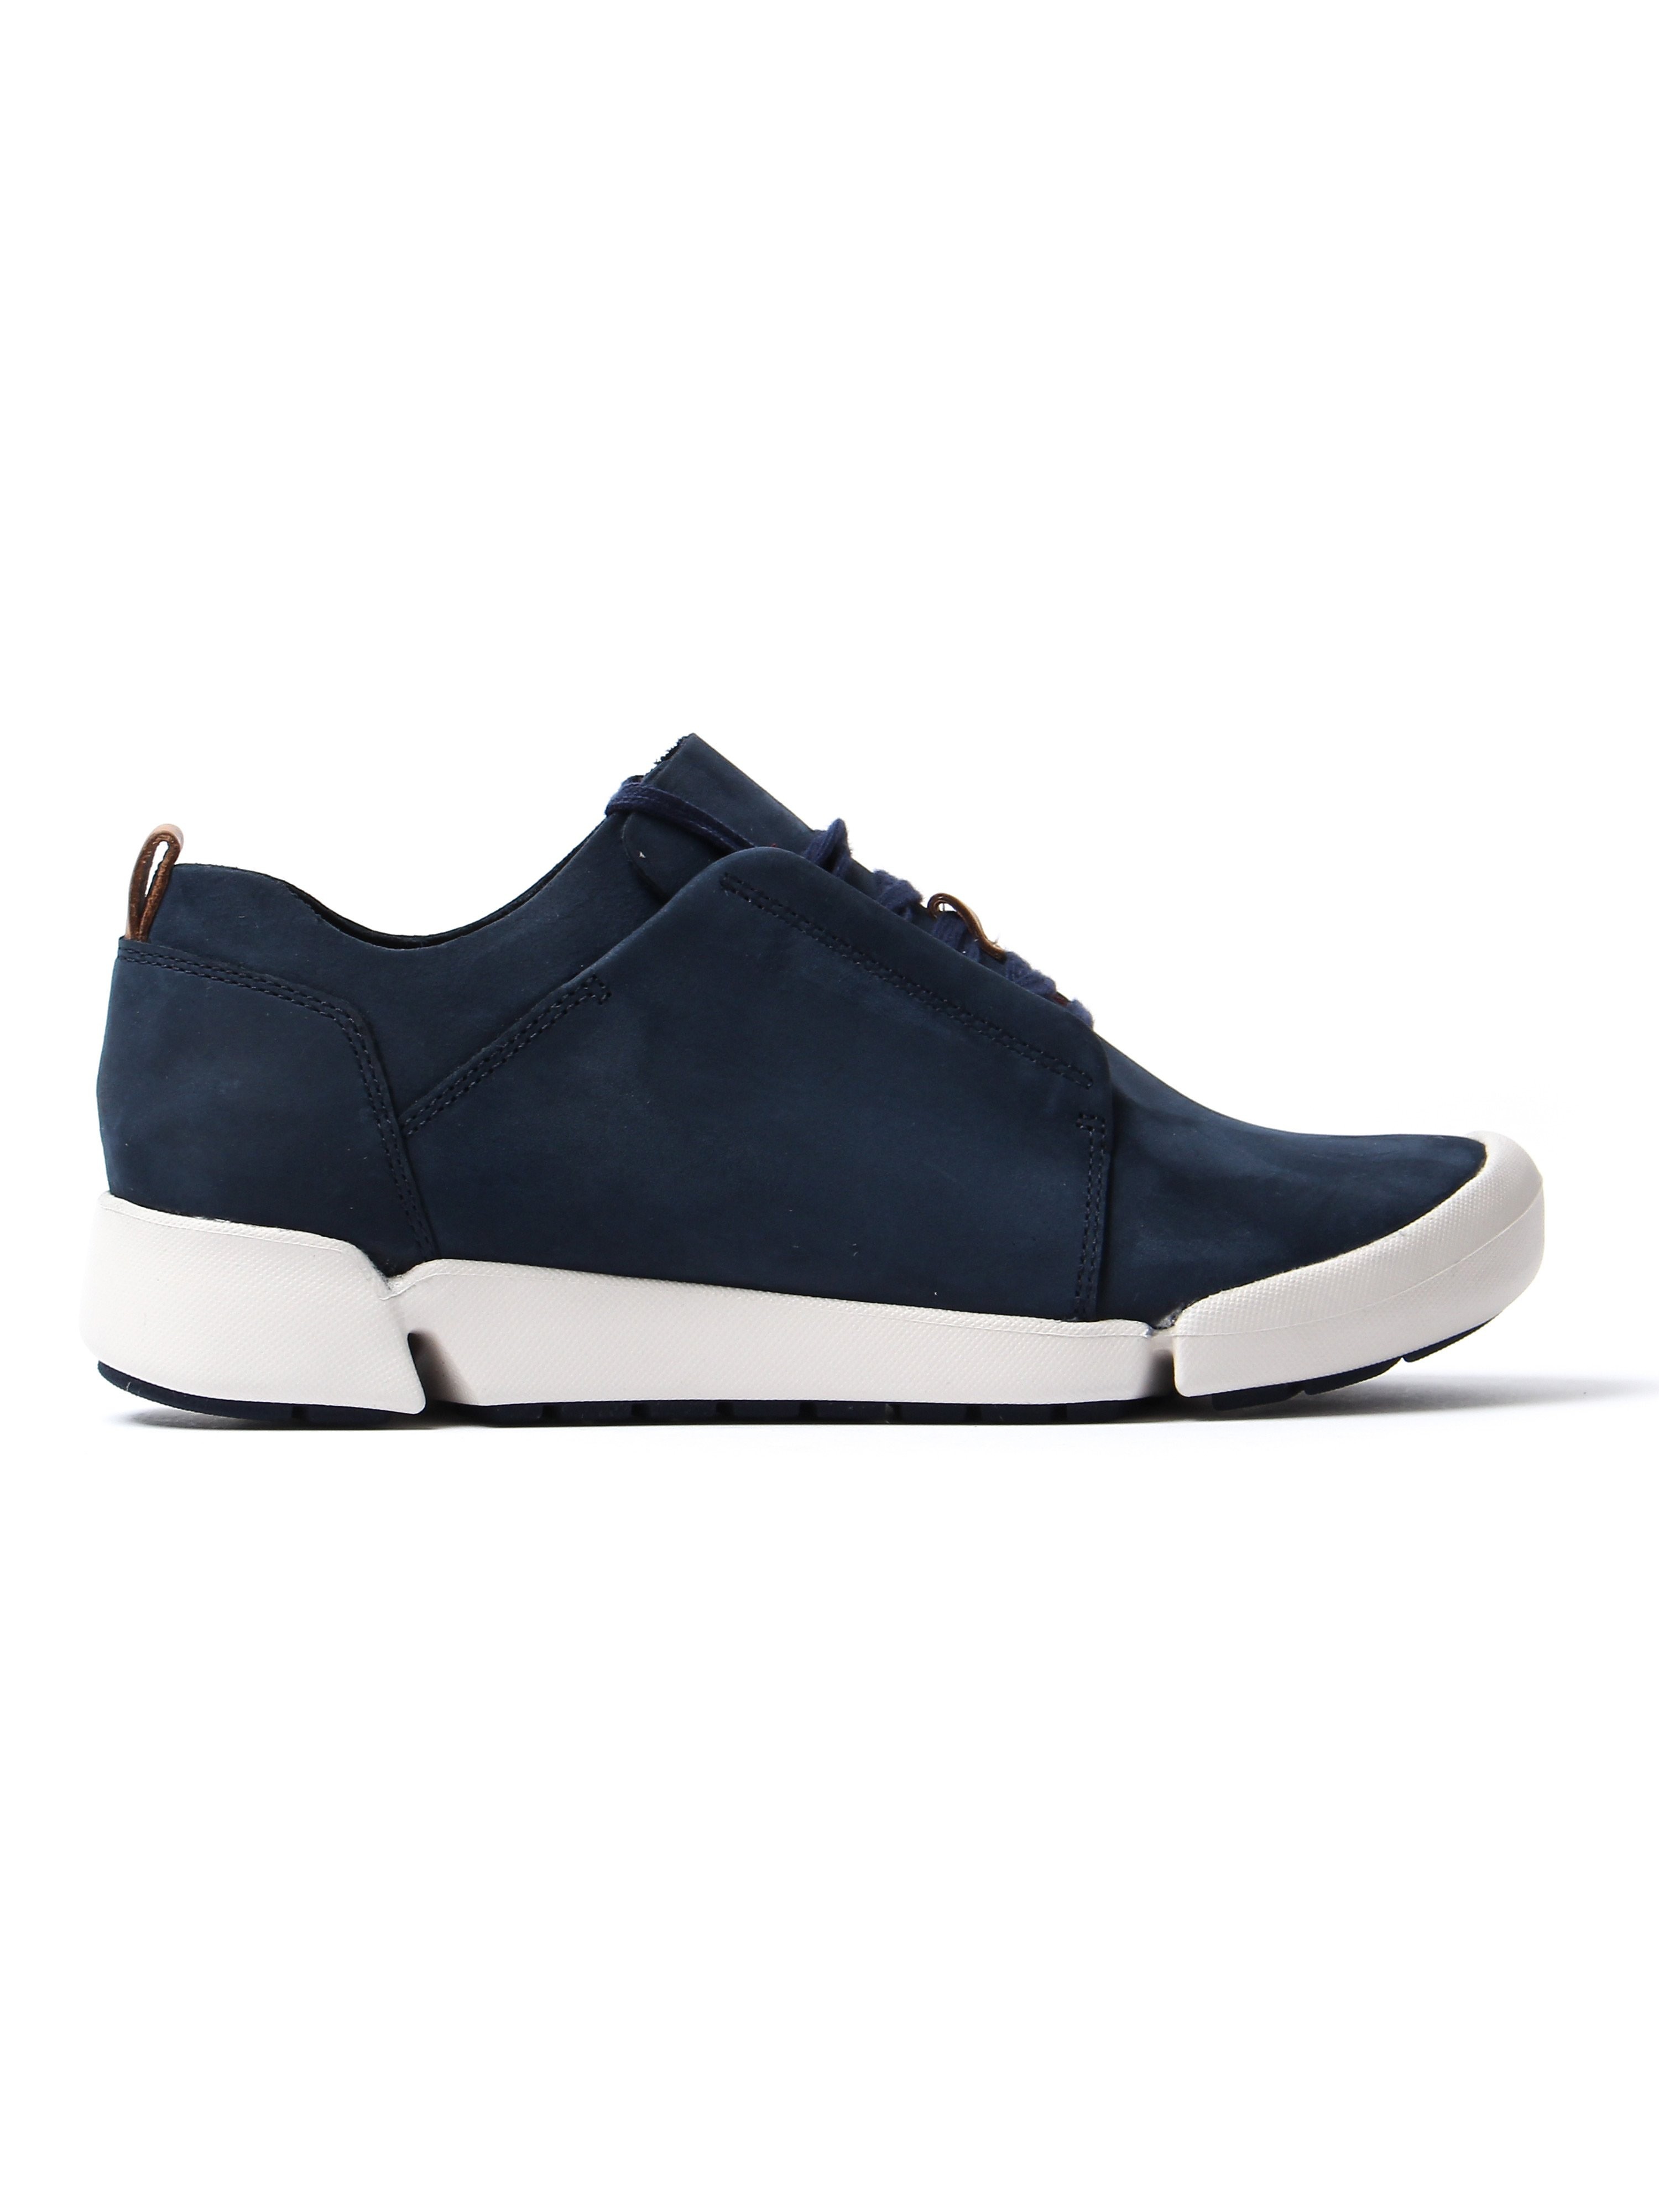 Clarks Women's Tri Bella Shoes - Navy Nubuck